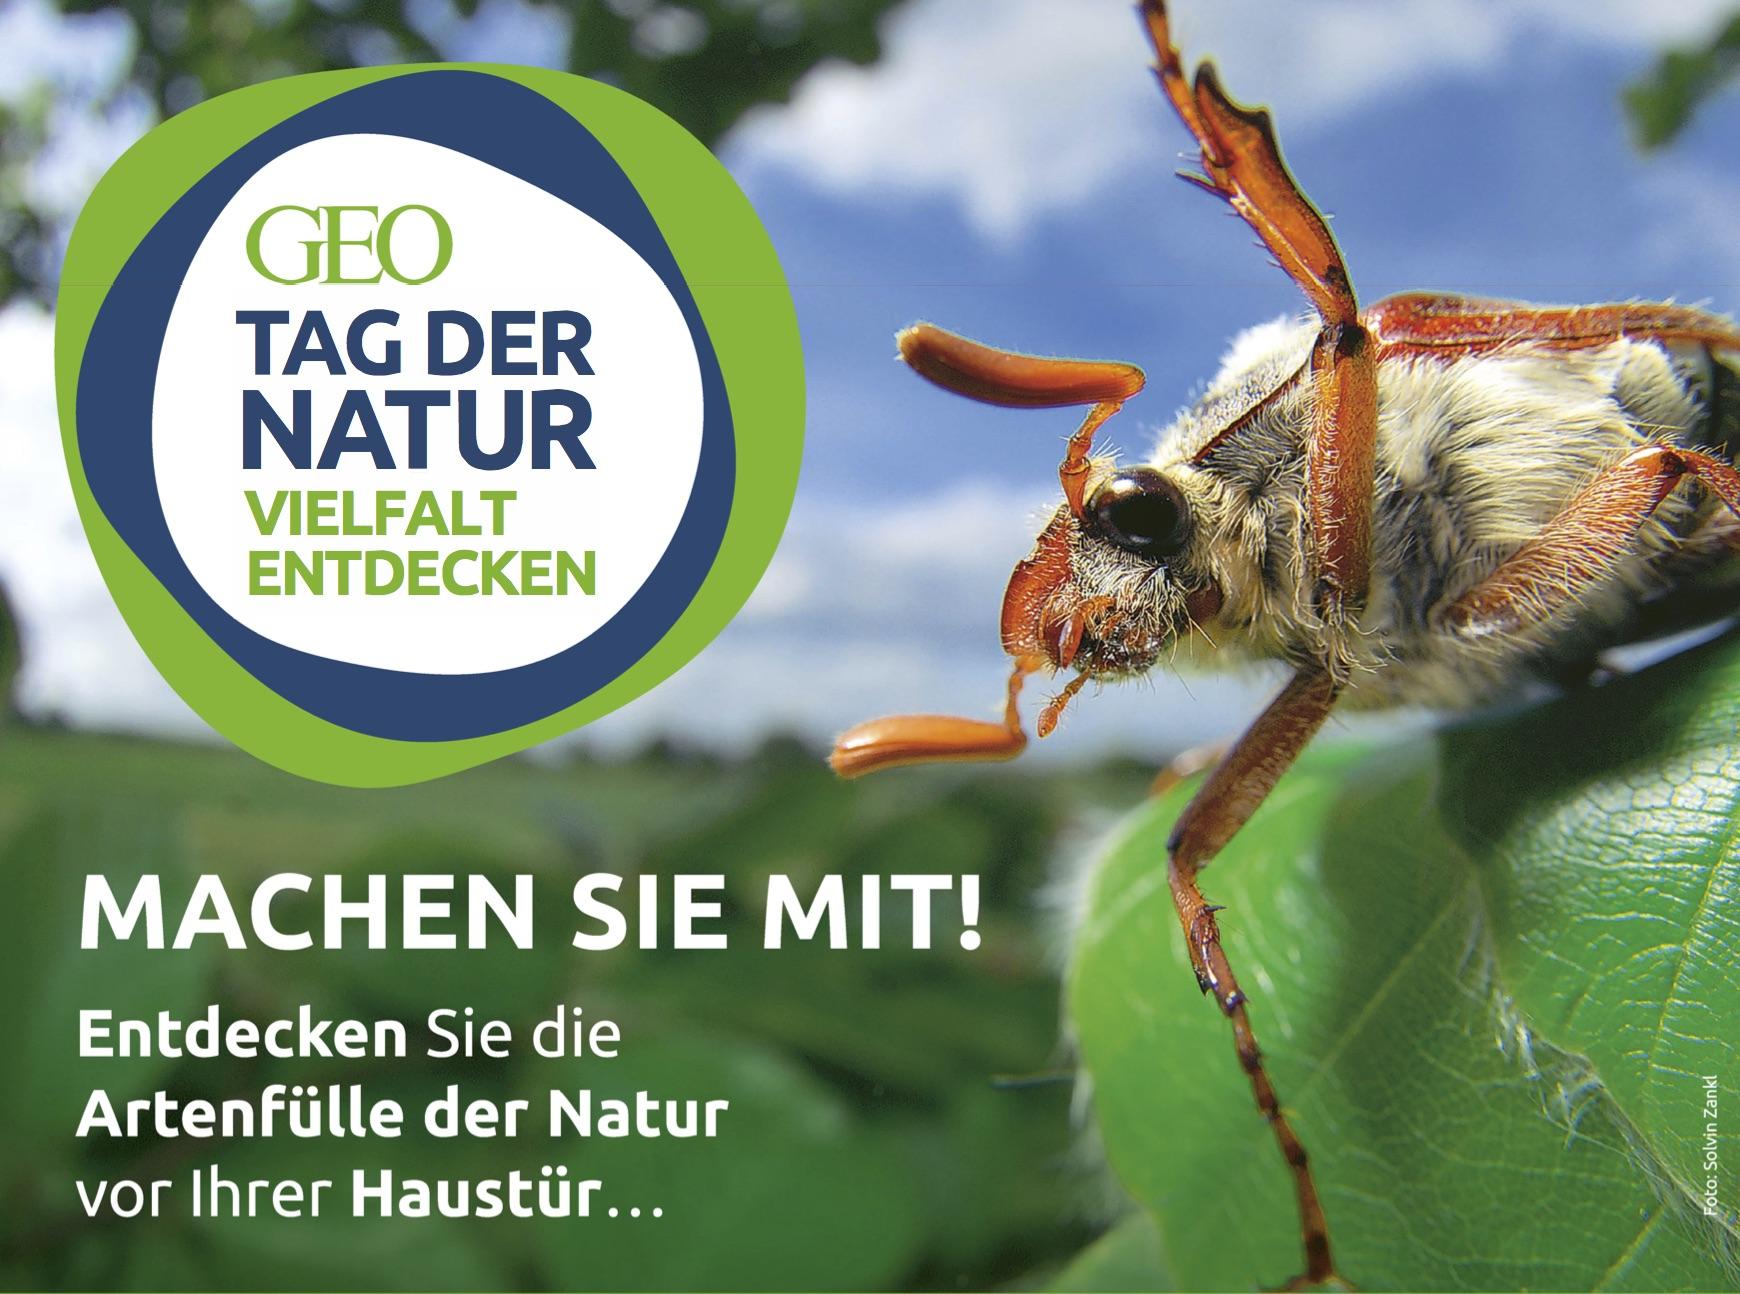 GEO_Tag_der_Natur_Ankuendigungsplakat_2017